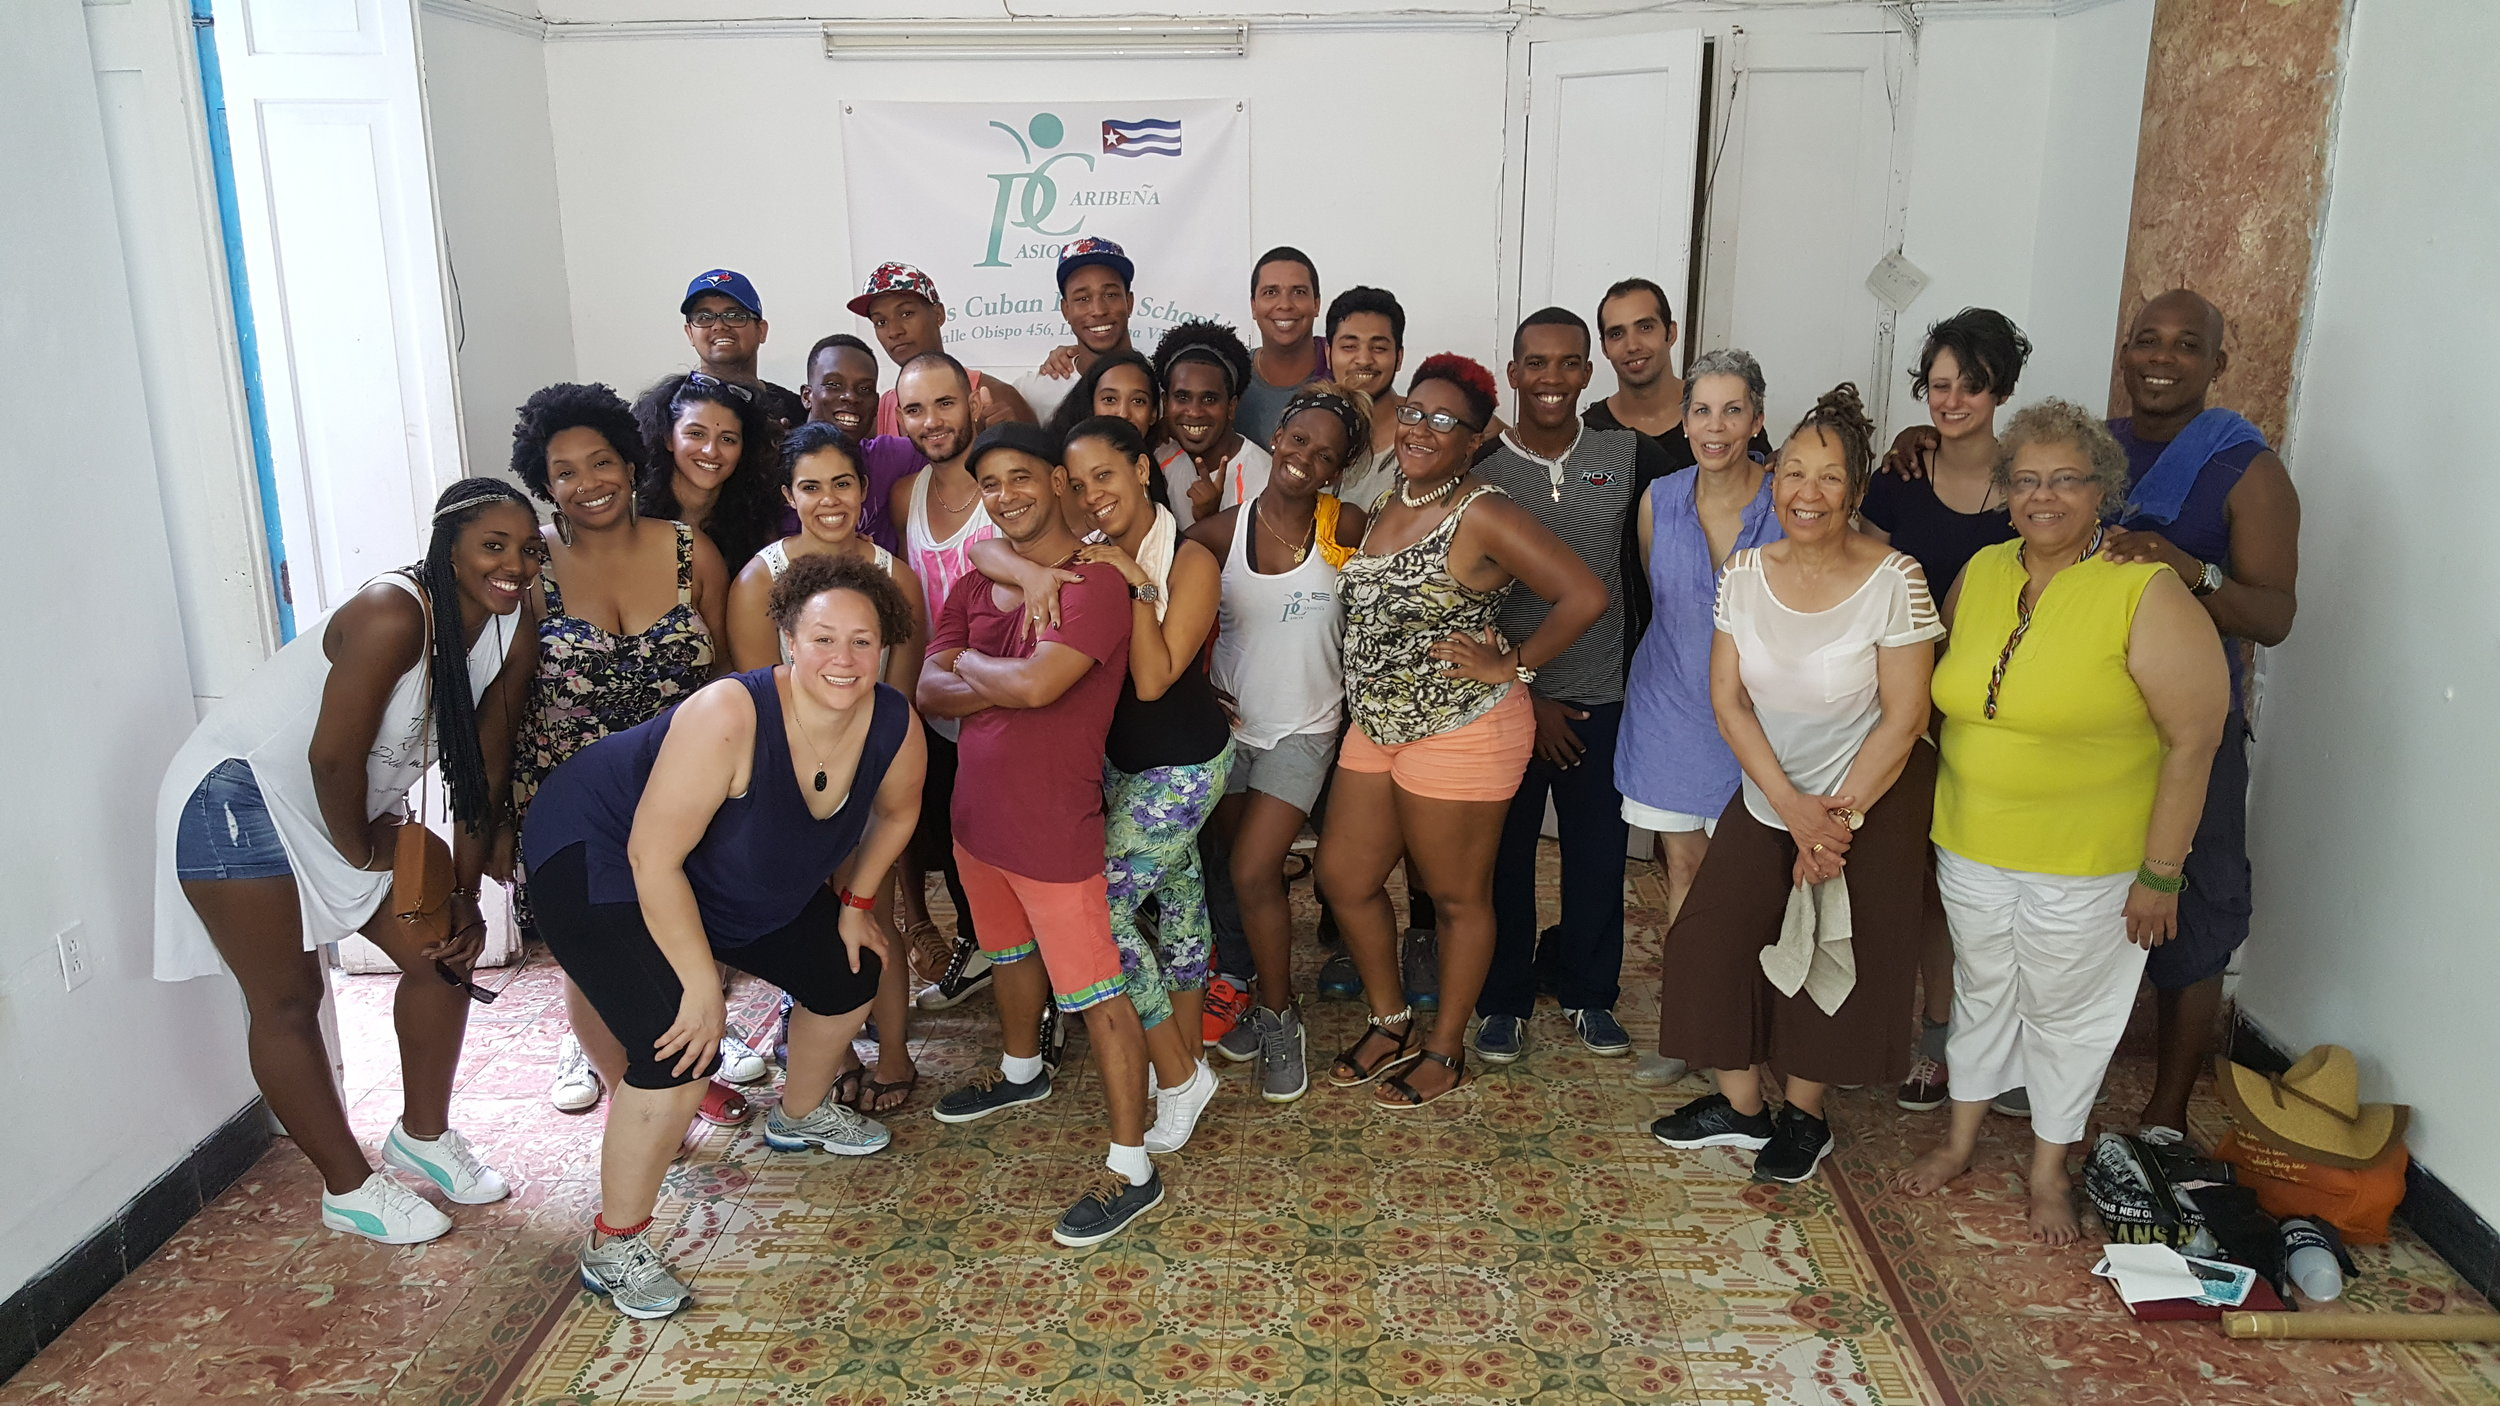 University of Baltimore Yale Gordon College of Arts and Sciences - 18 Days/17 Nights - Havana & Matanzas, Cuba | Sat., June 11, 2016 - Tues., June 28, 2016